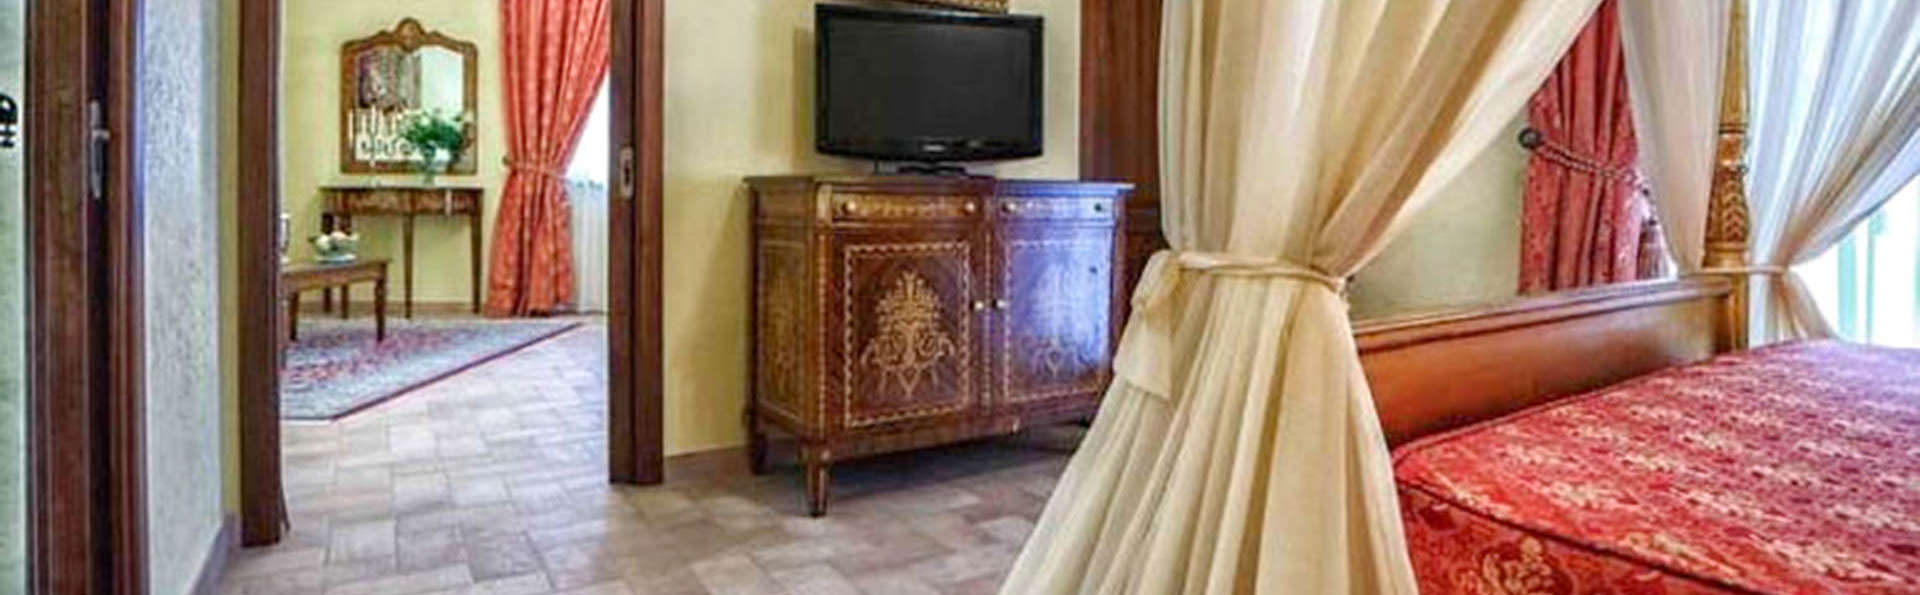 Grand Hotel Vigna Nocelli - EDIT_suite_01.jpg